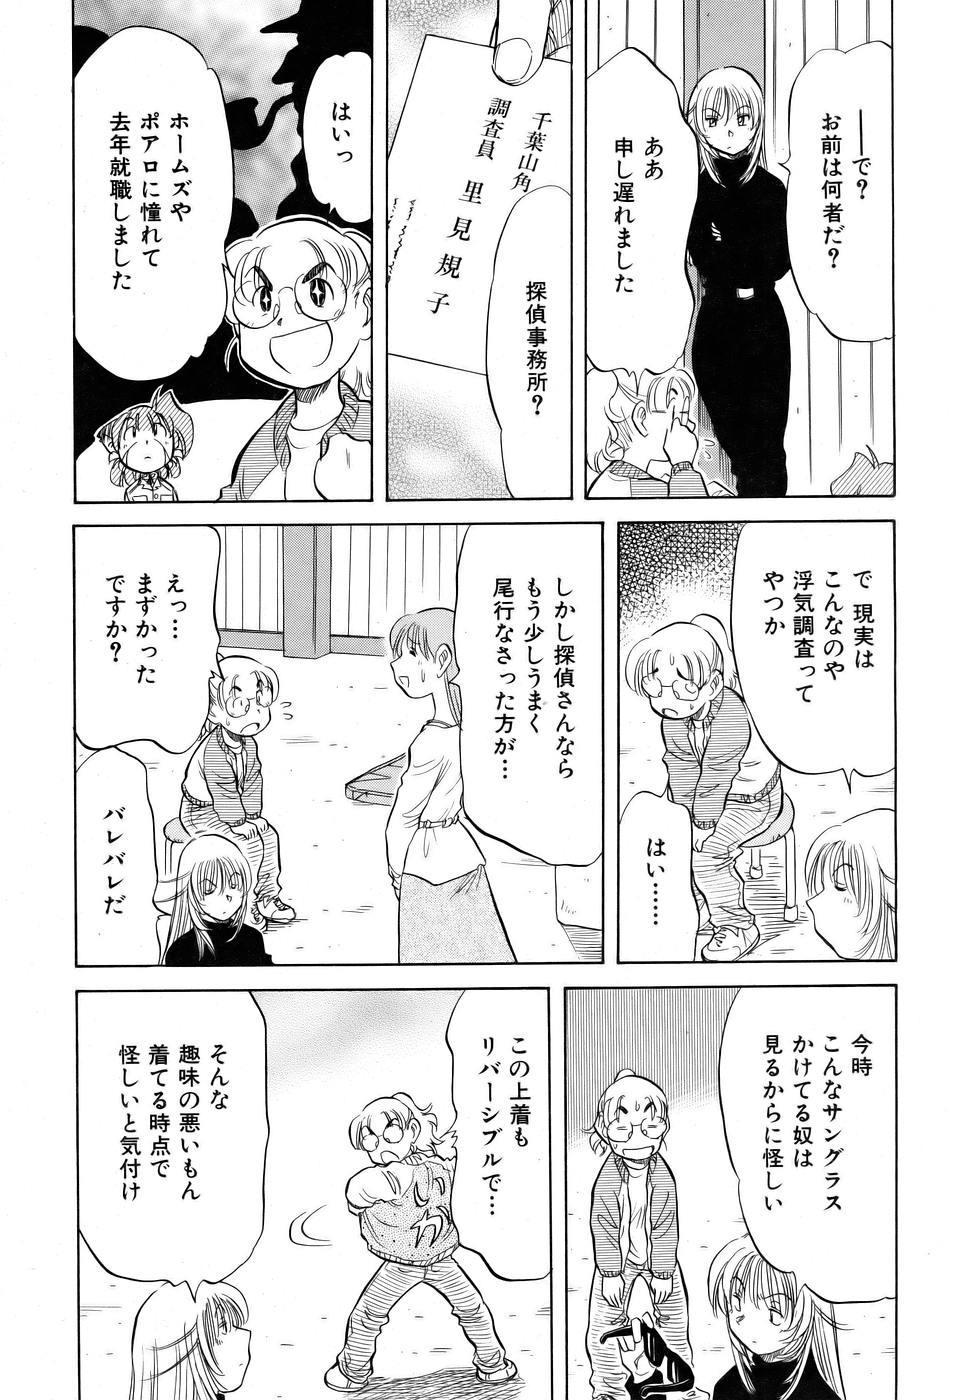 COMIC AUN 2005-12 Vol. 115 188